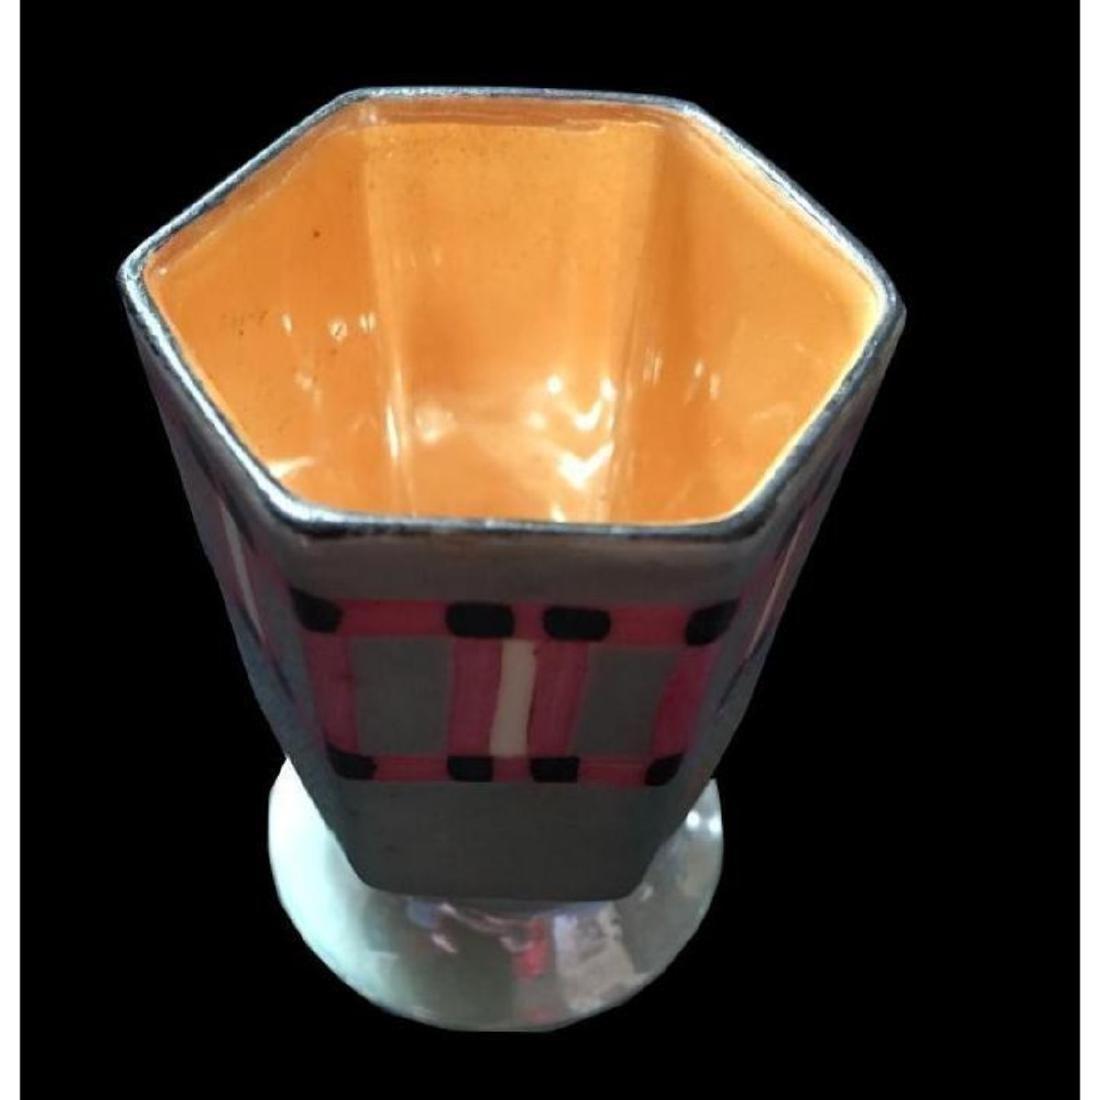 Noritake Art Deco Porcelain Toothpick Cup Vase - 2